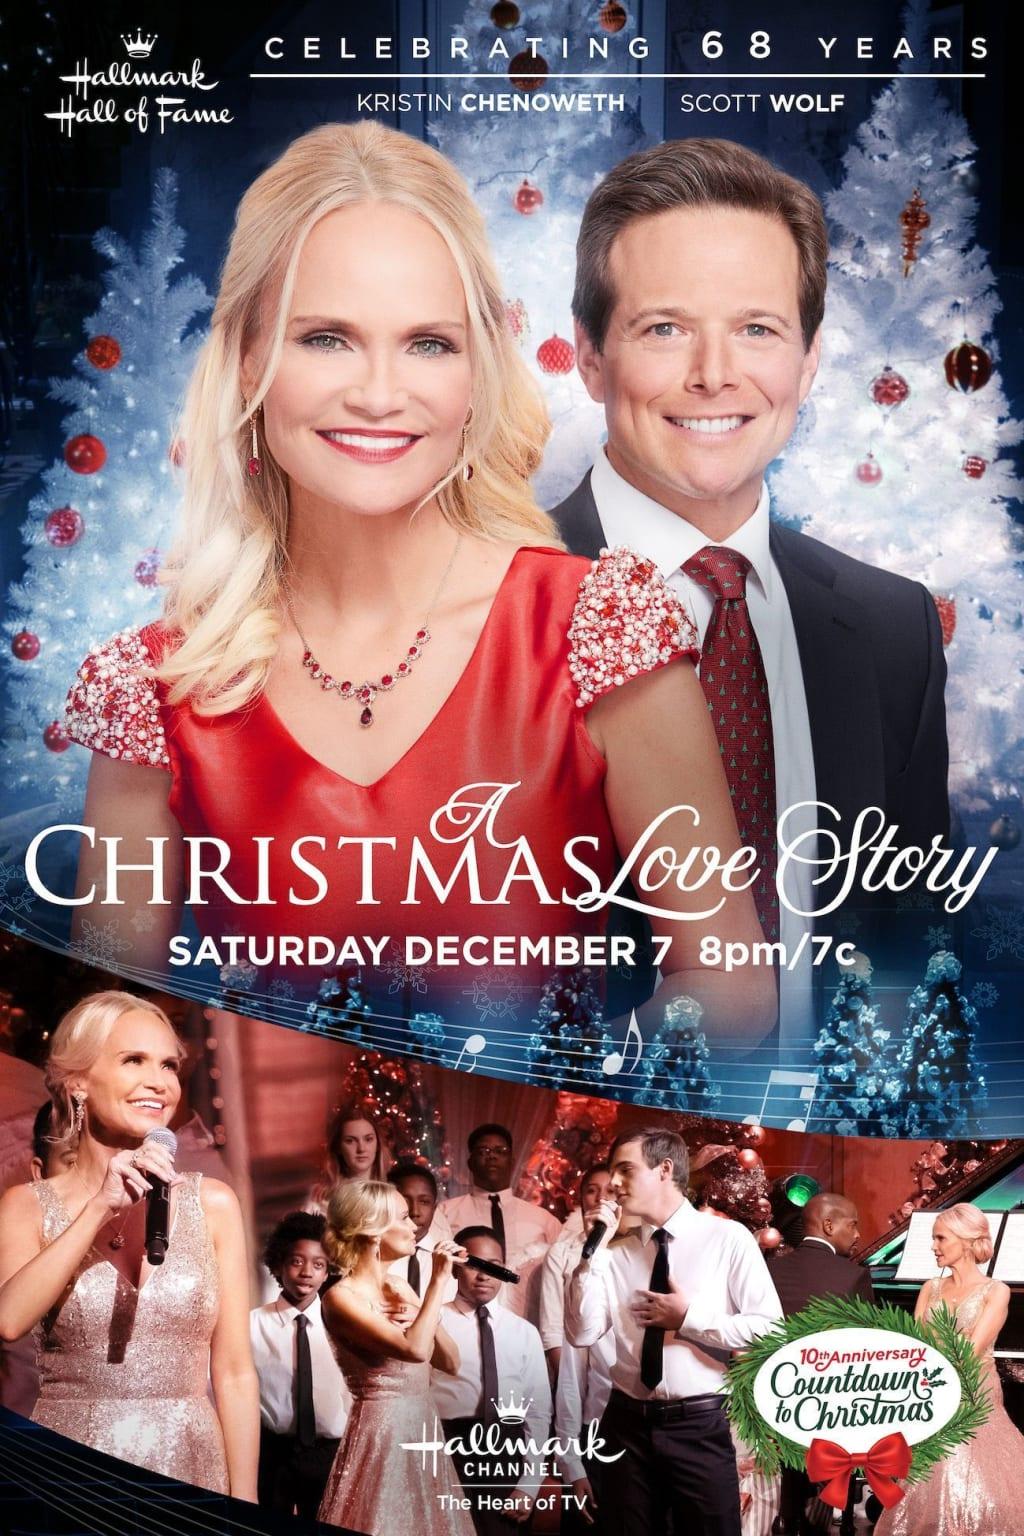 Hallmark Review: 'A Christmas Love Story'